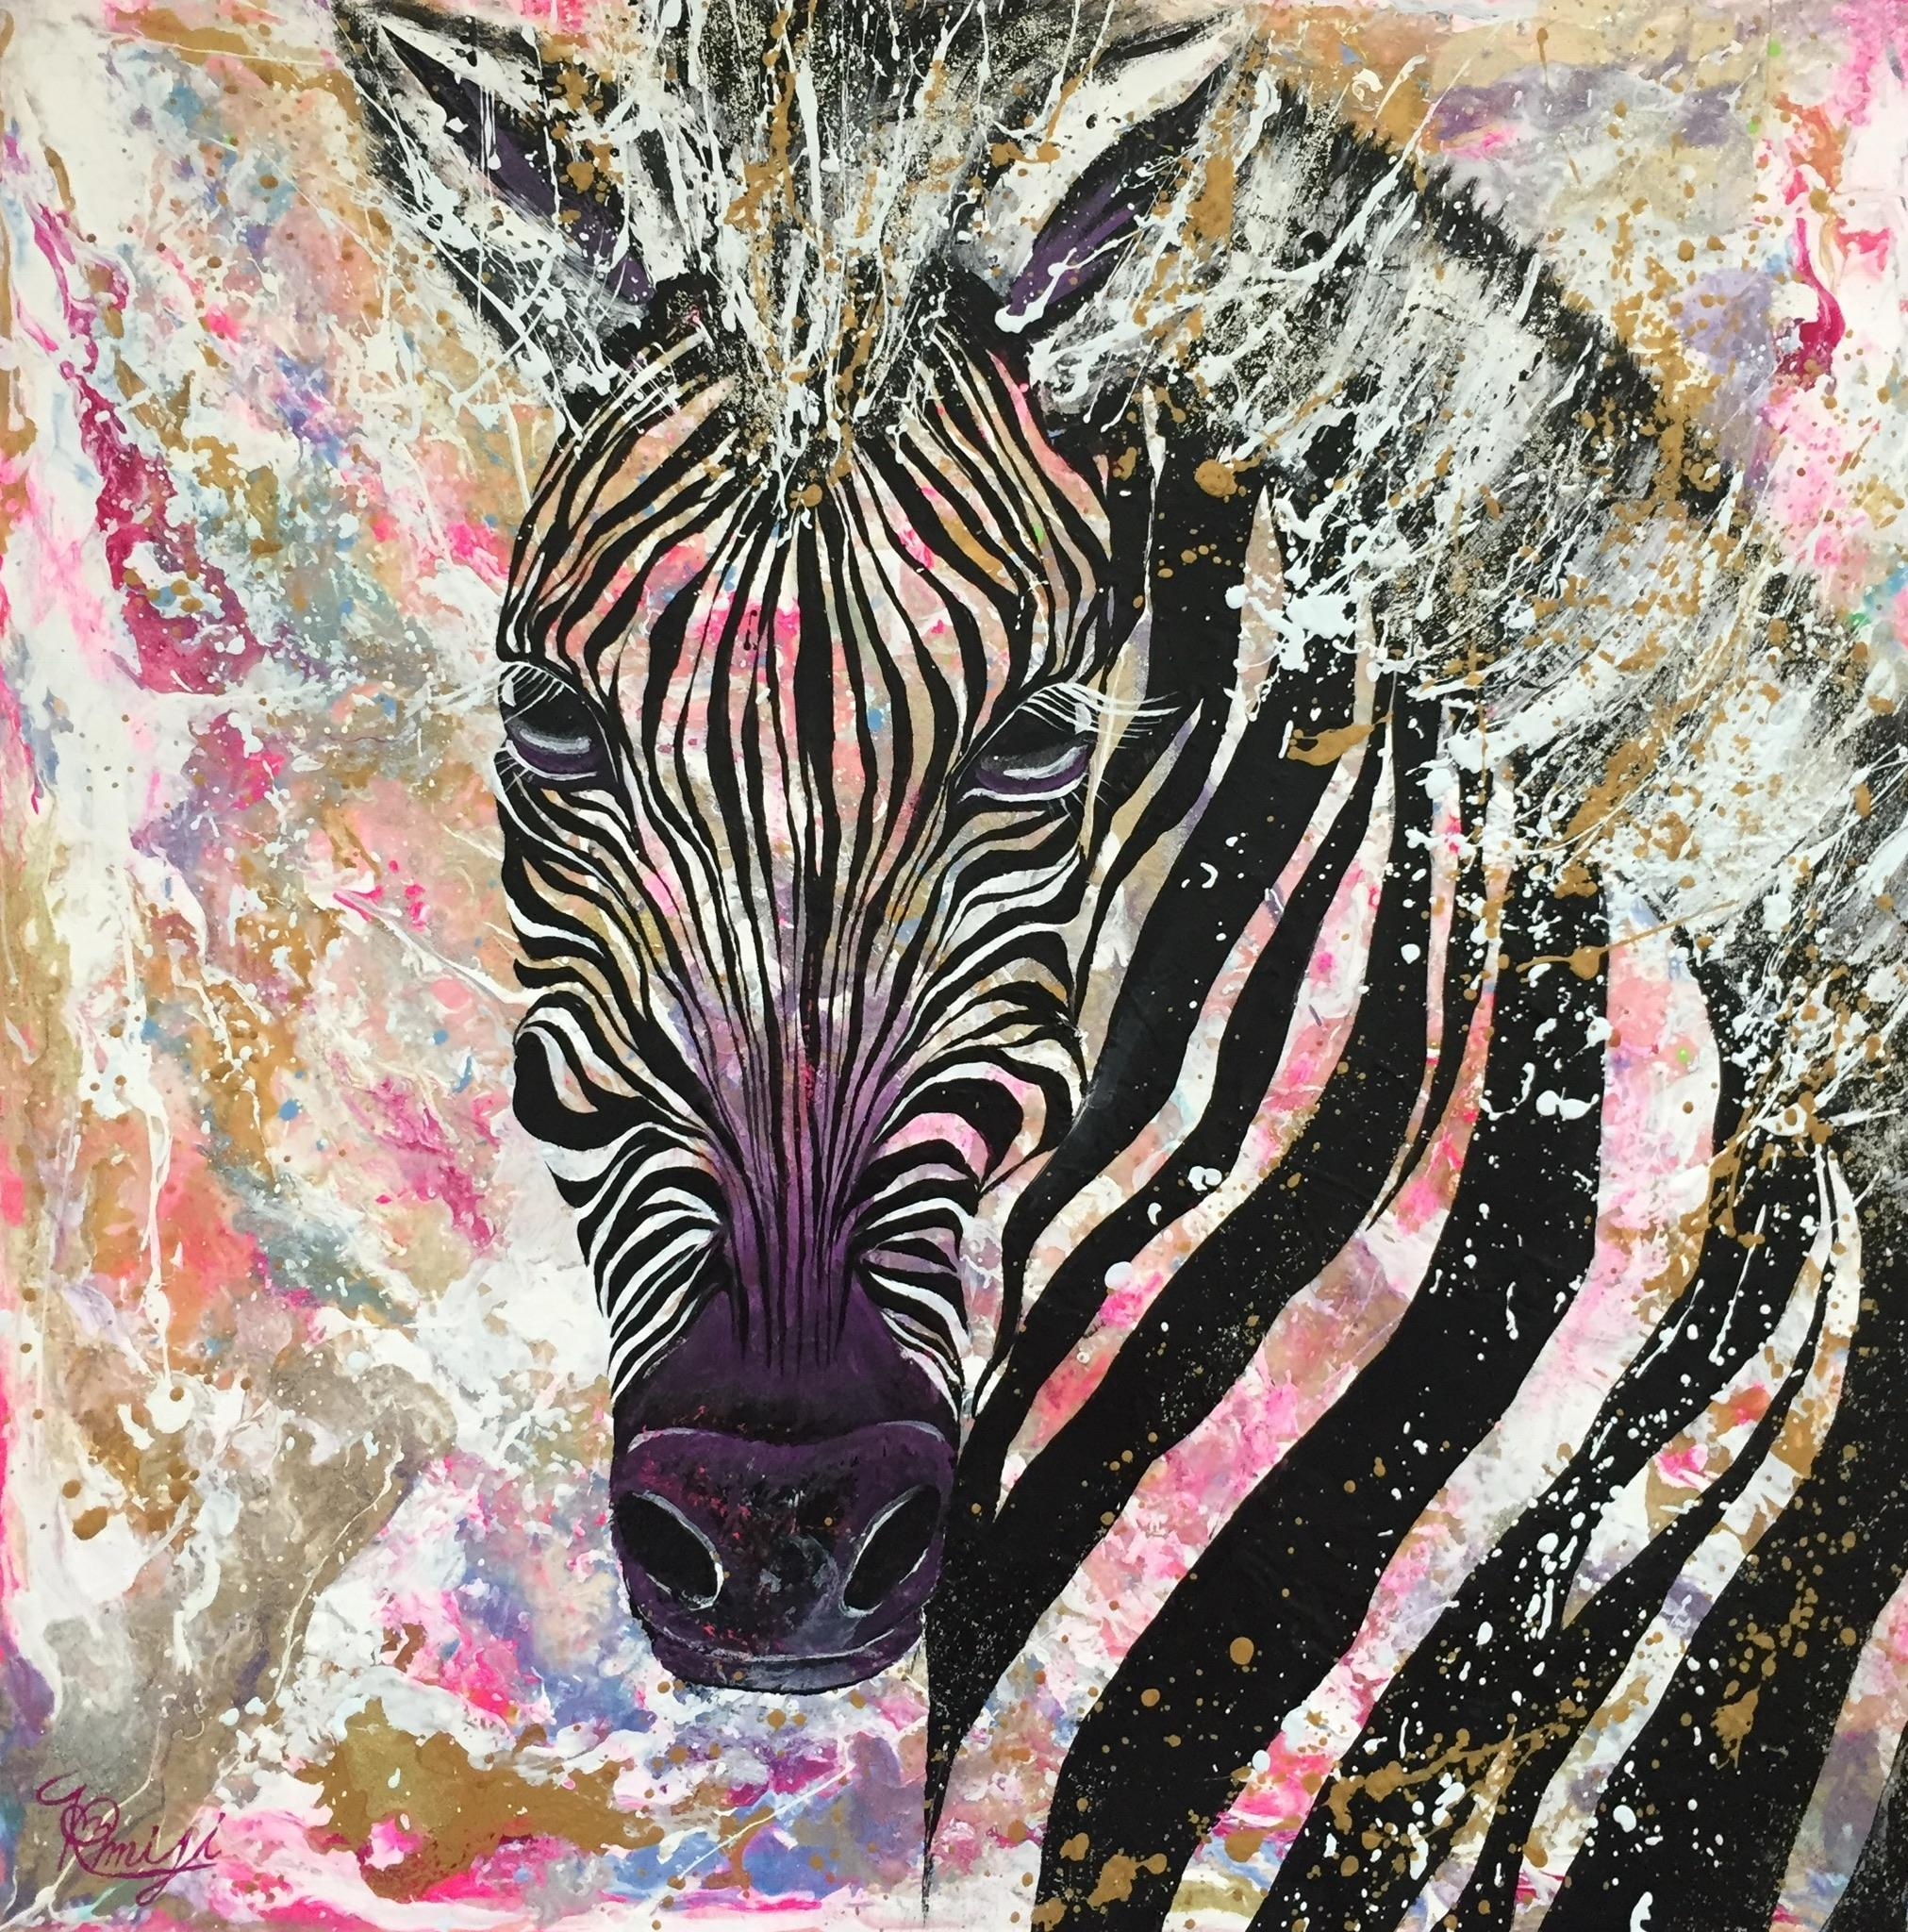 『parhelion』  acrylic on canvas ( 45.5×45.5cm/ S8)第24回 アートムーブコンクール 入選作品